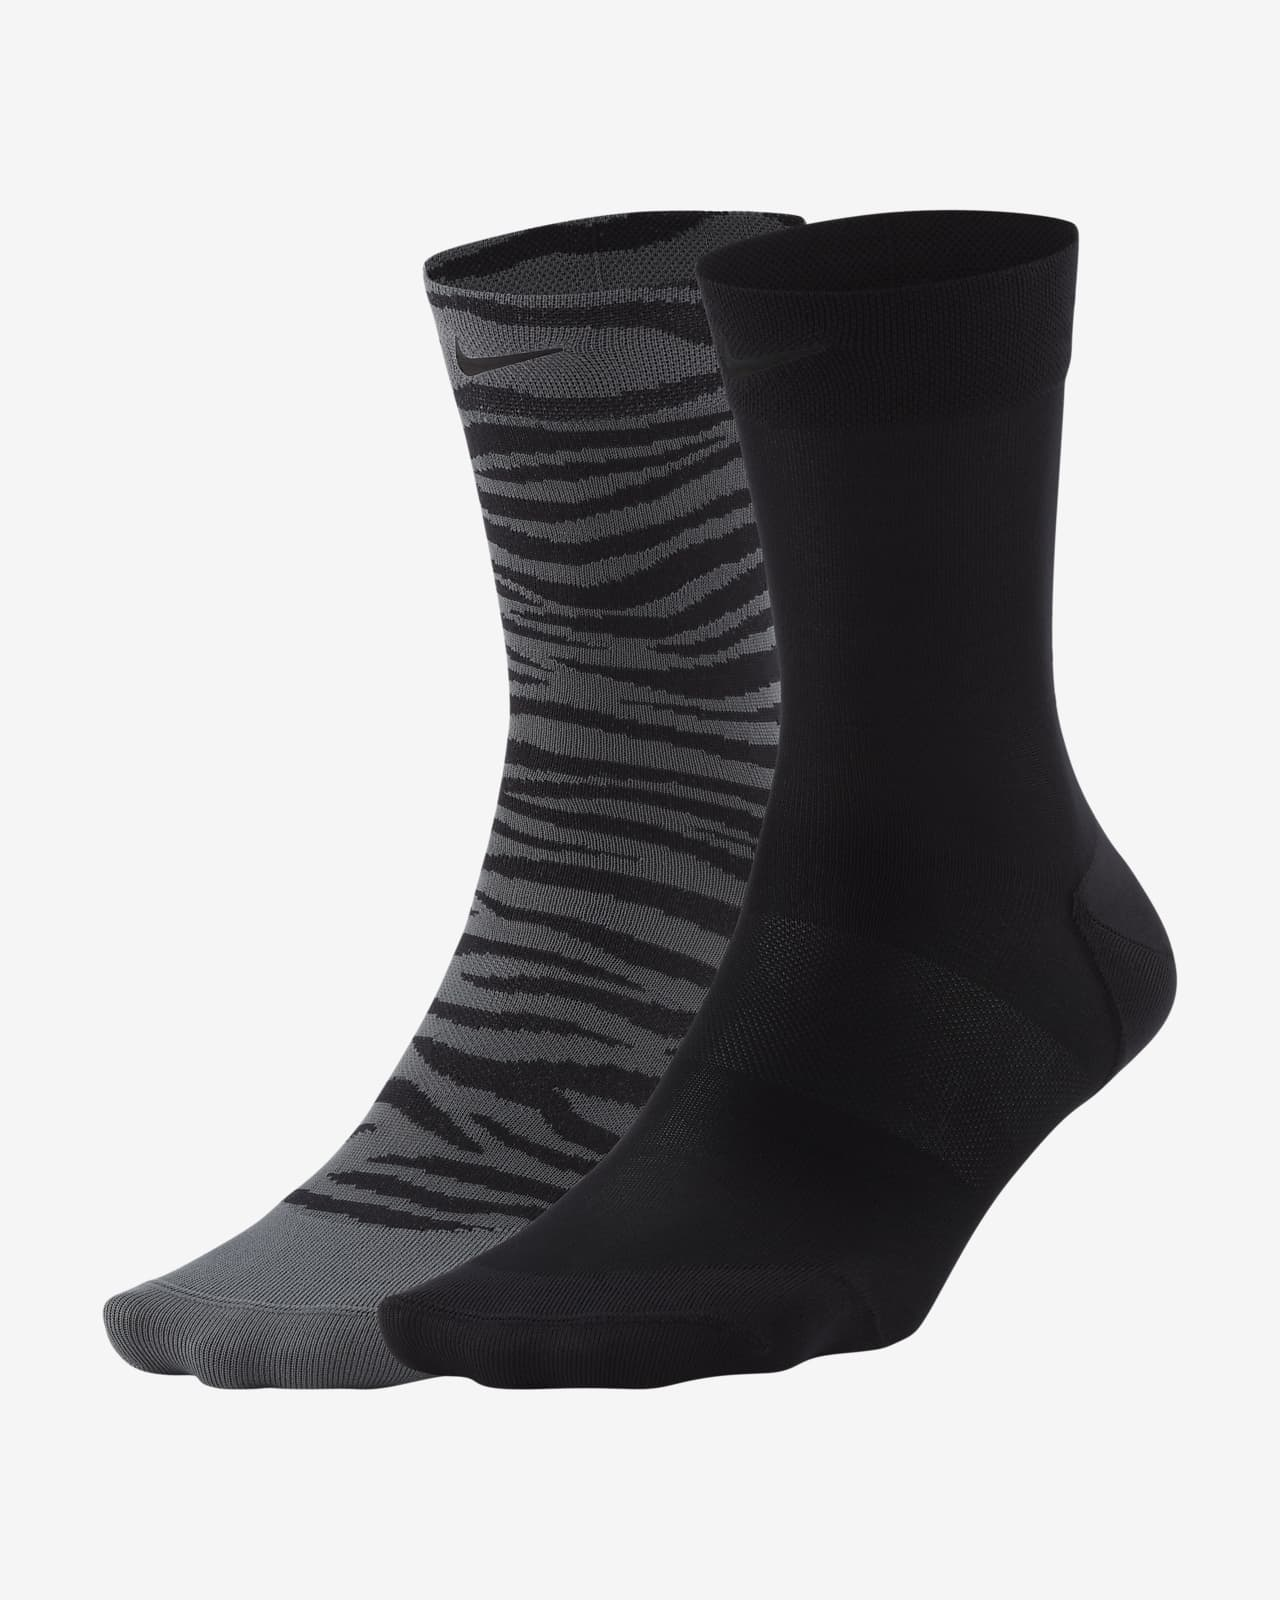 Nike Sheer Ankle 女子训练袜(2 双)